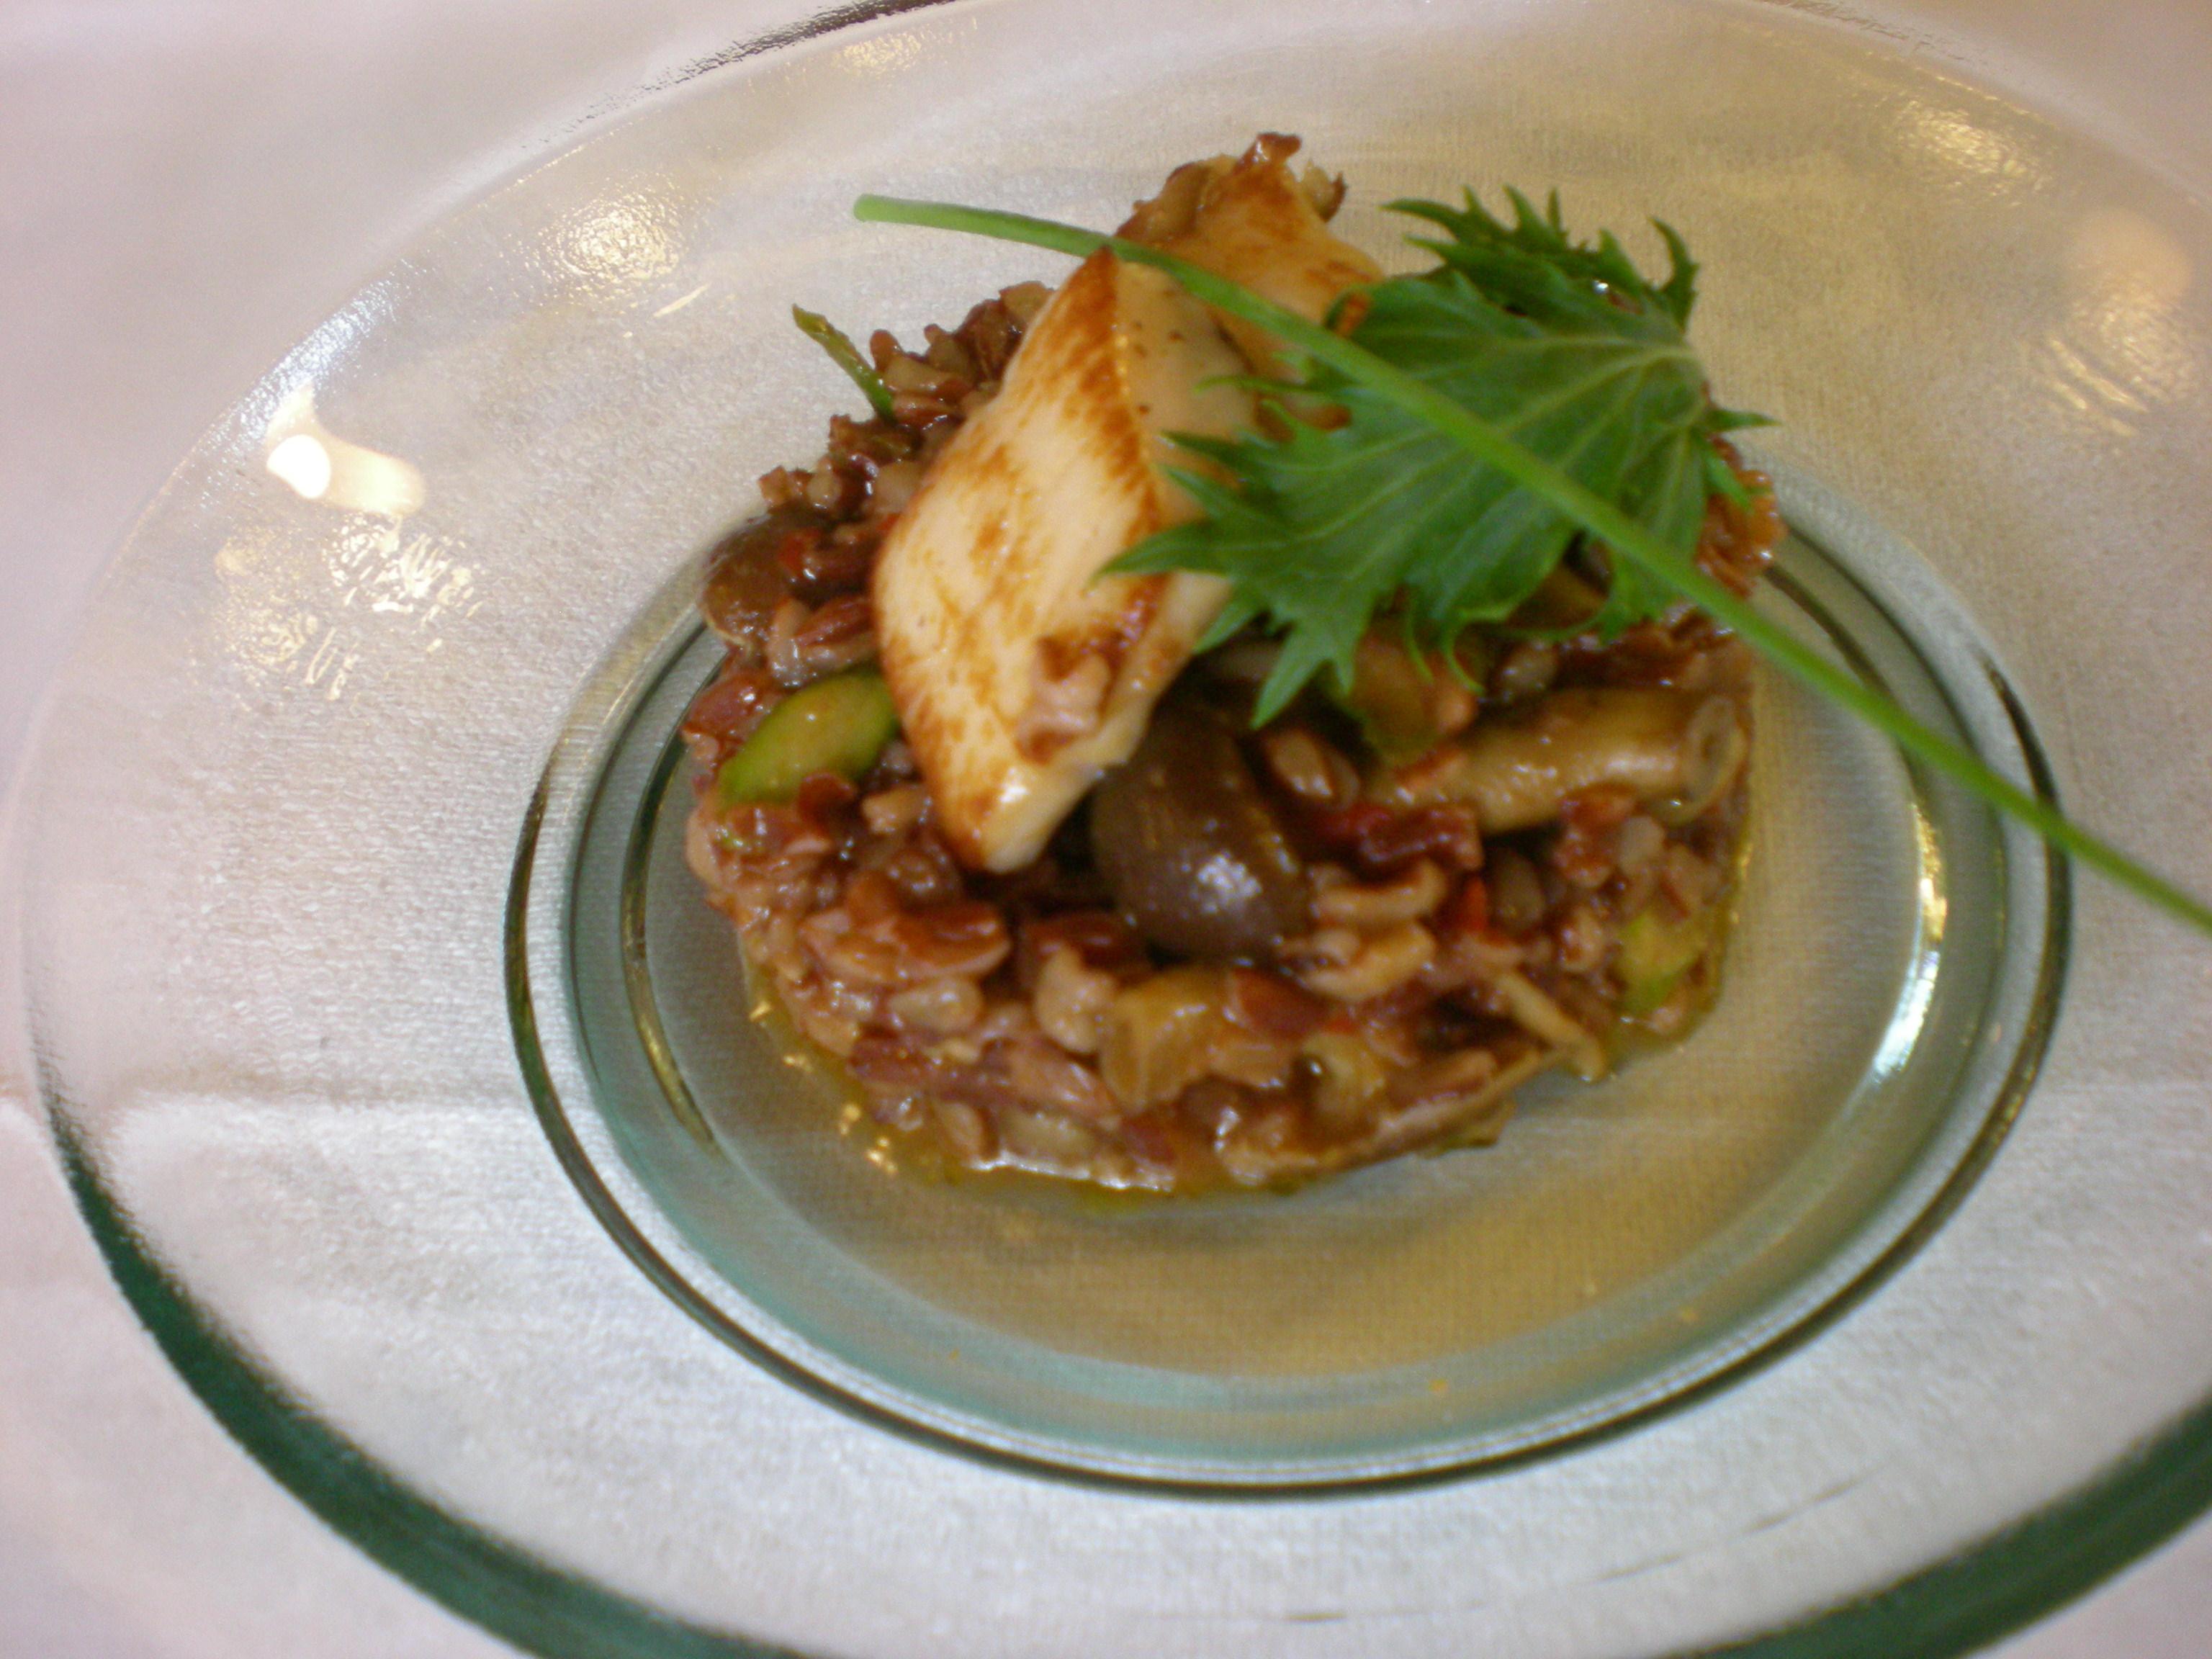 Restaurante alzira canela y clavo restaurante xativa alzira - Donde comprar arroz salvaje ...